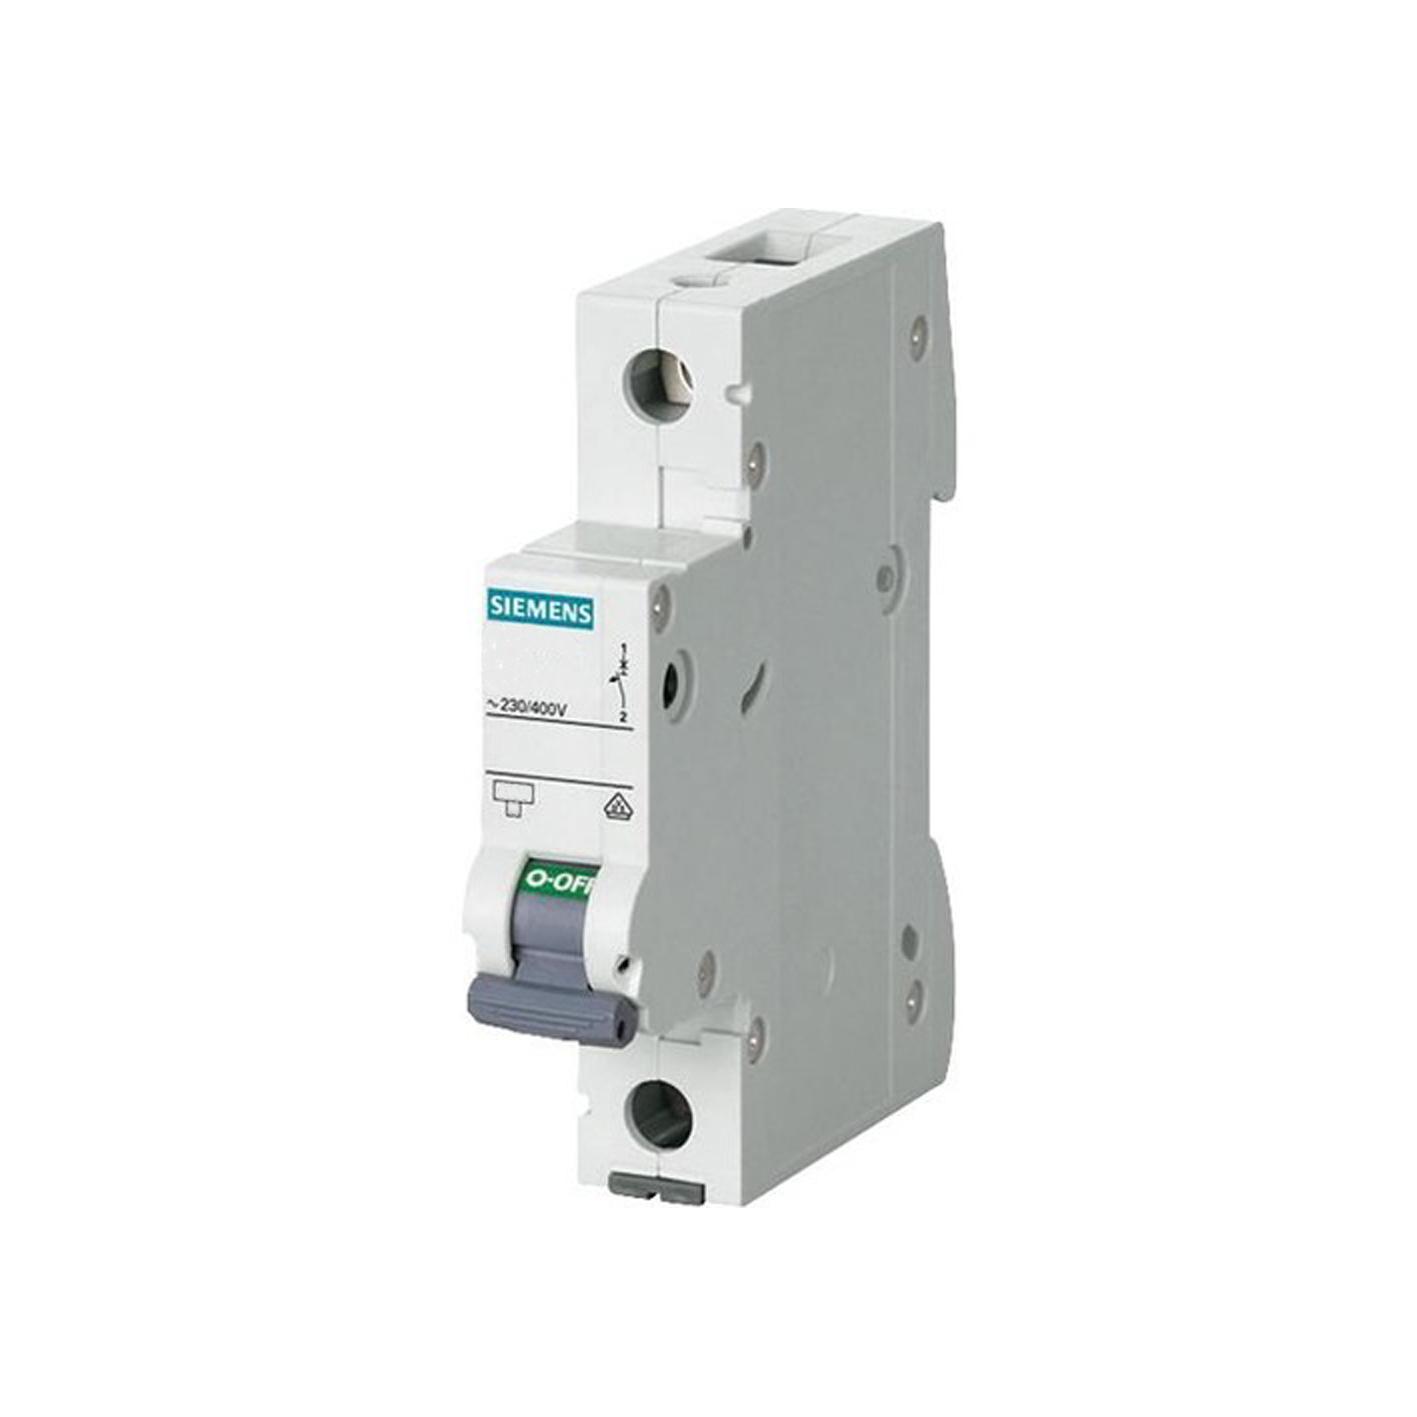 Siemens 1x16A Otomatik Sigorta